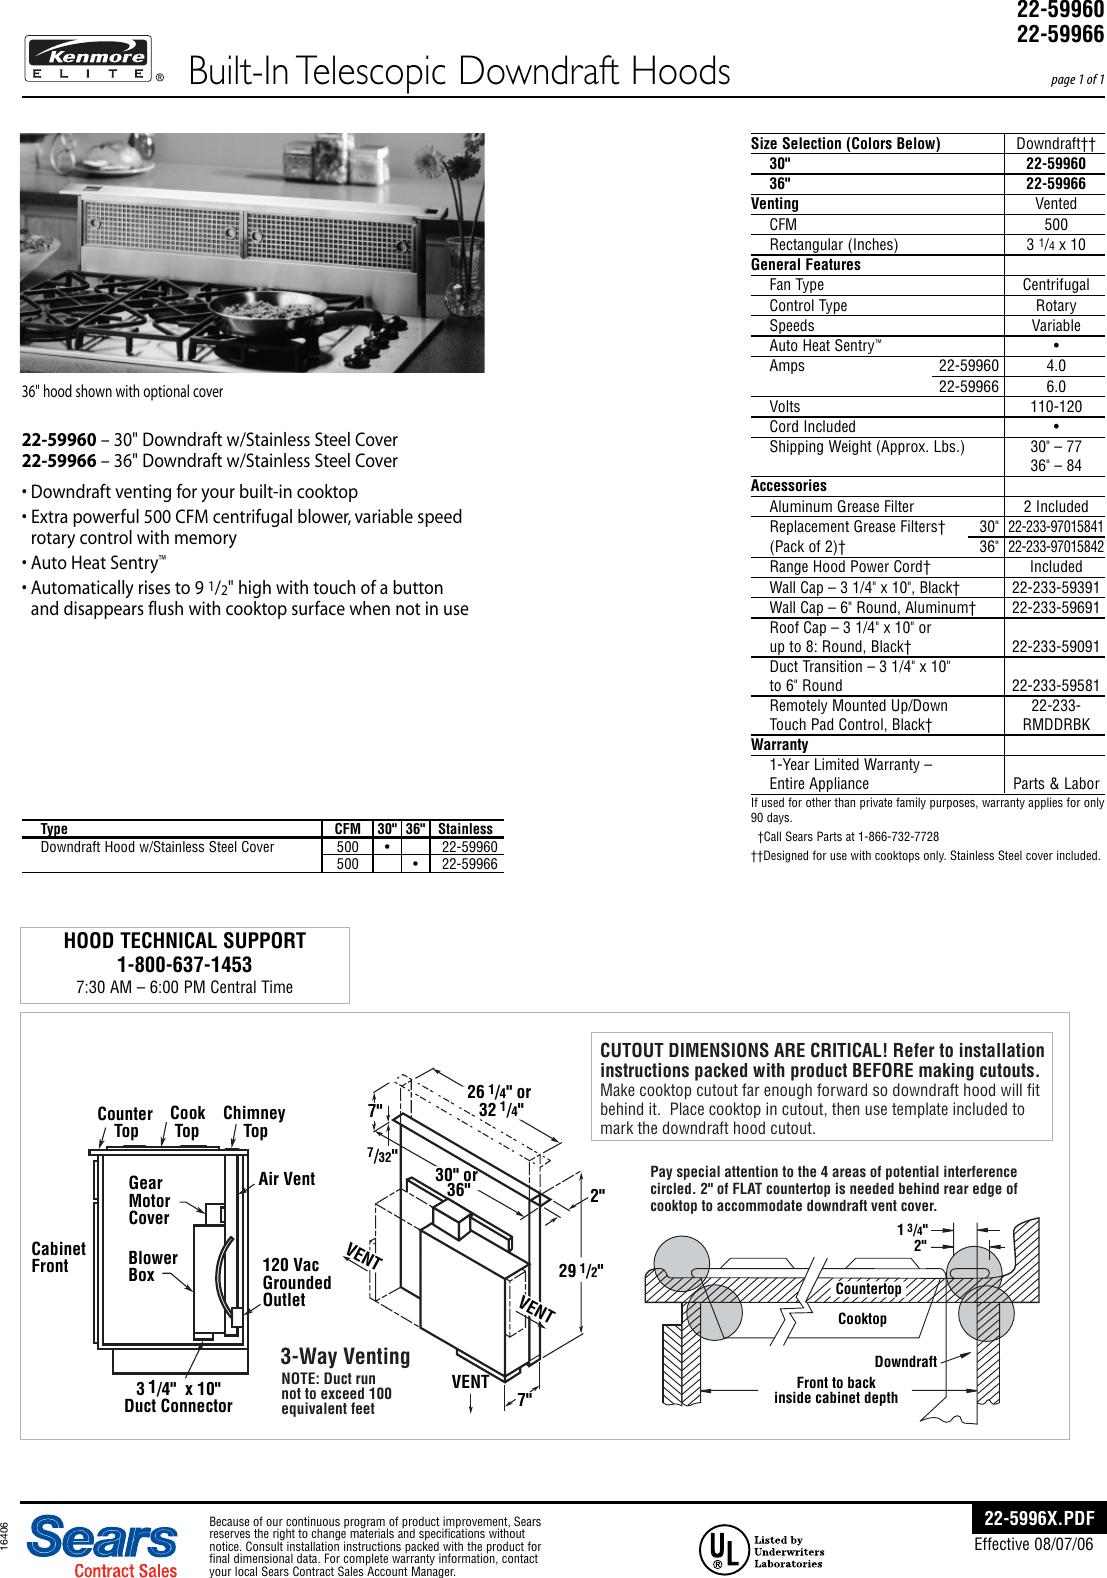 Kenmore Elite 30 Down Hood 59960 Installation Guide